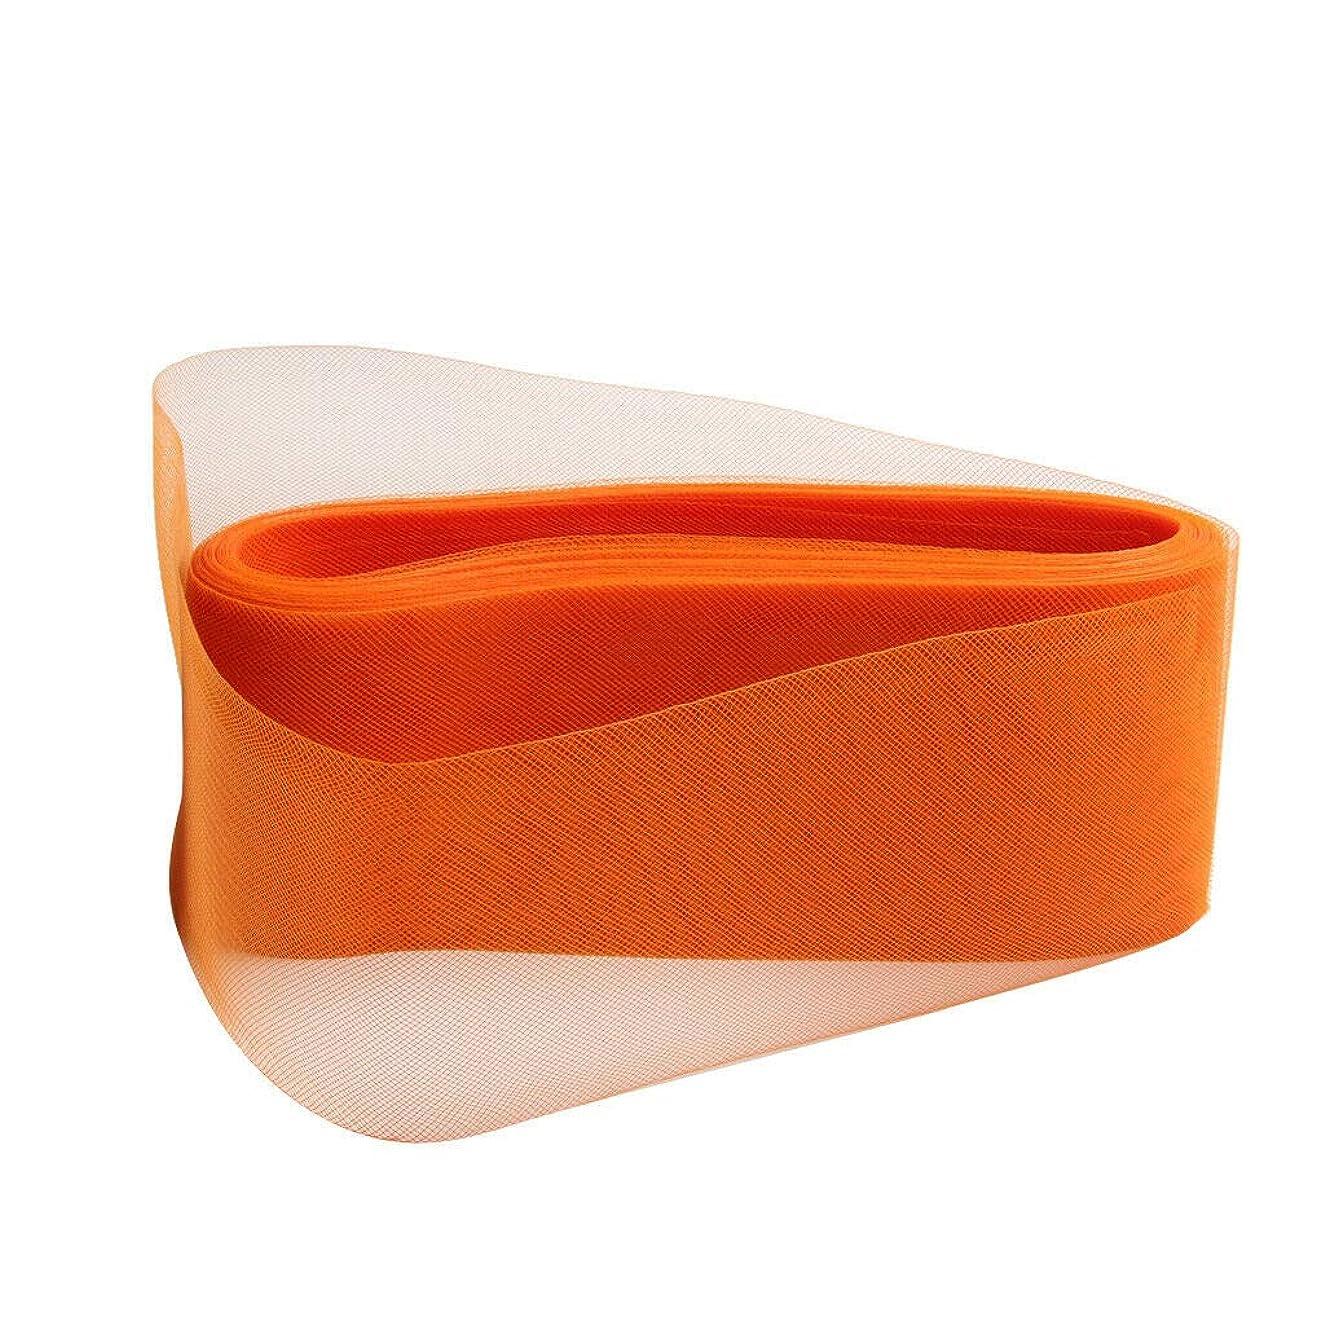 Crinoline Flexible Sinamy Crinoline Horse Hair Braid DIY for Fascinators Hat | Color - Orange